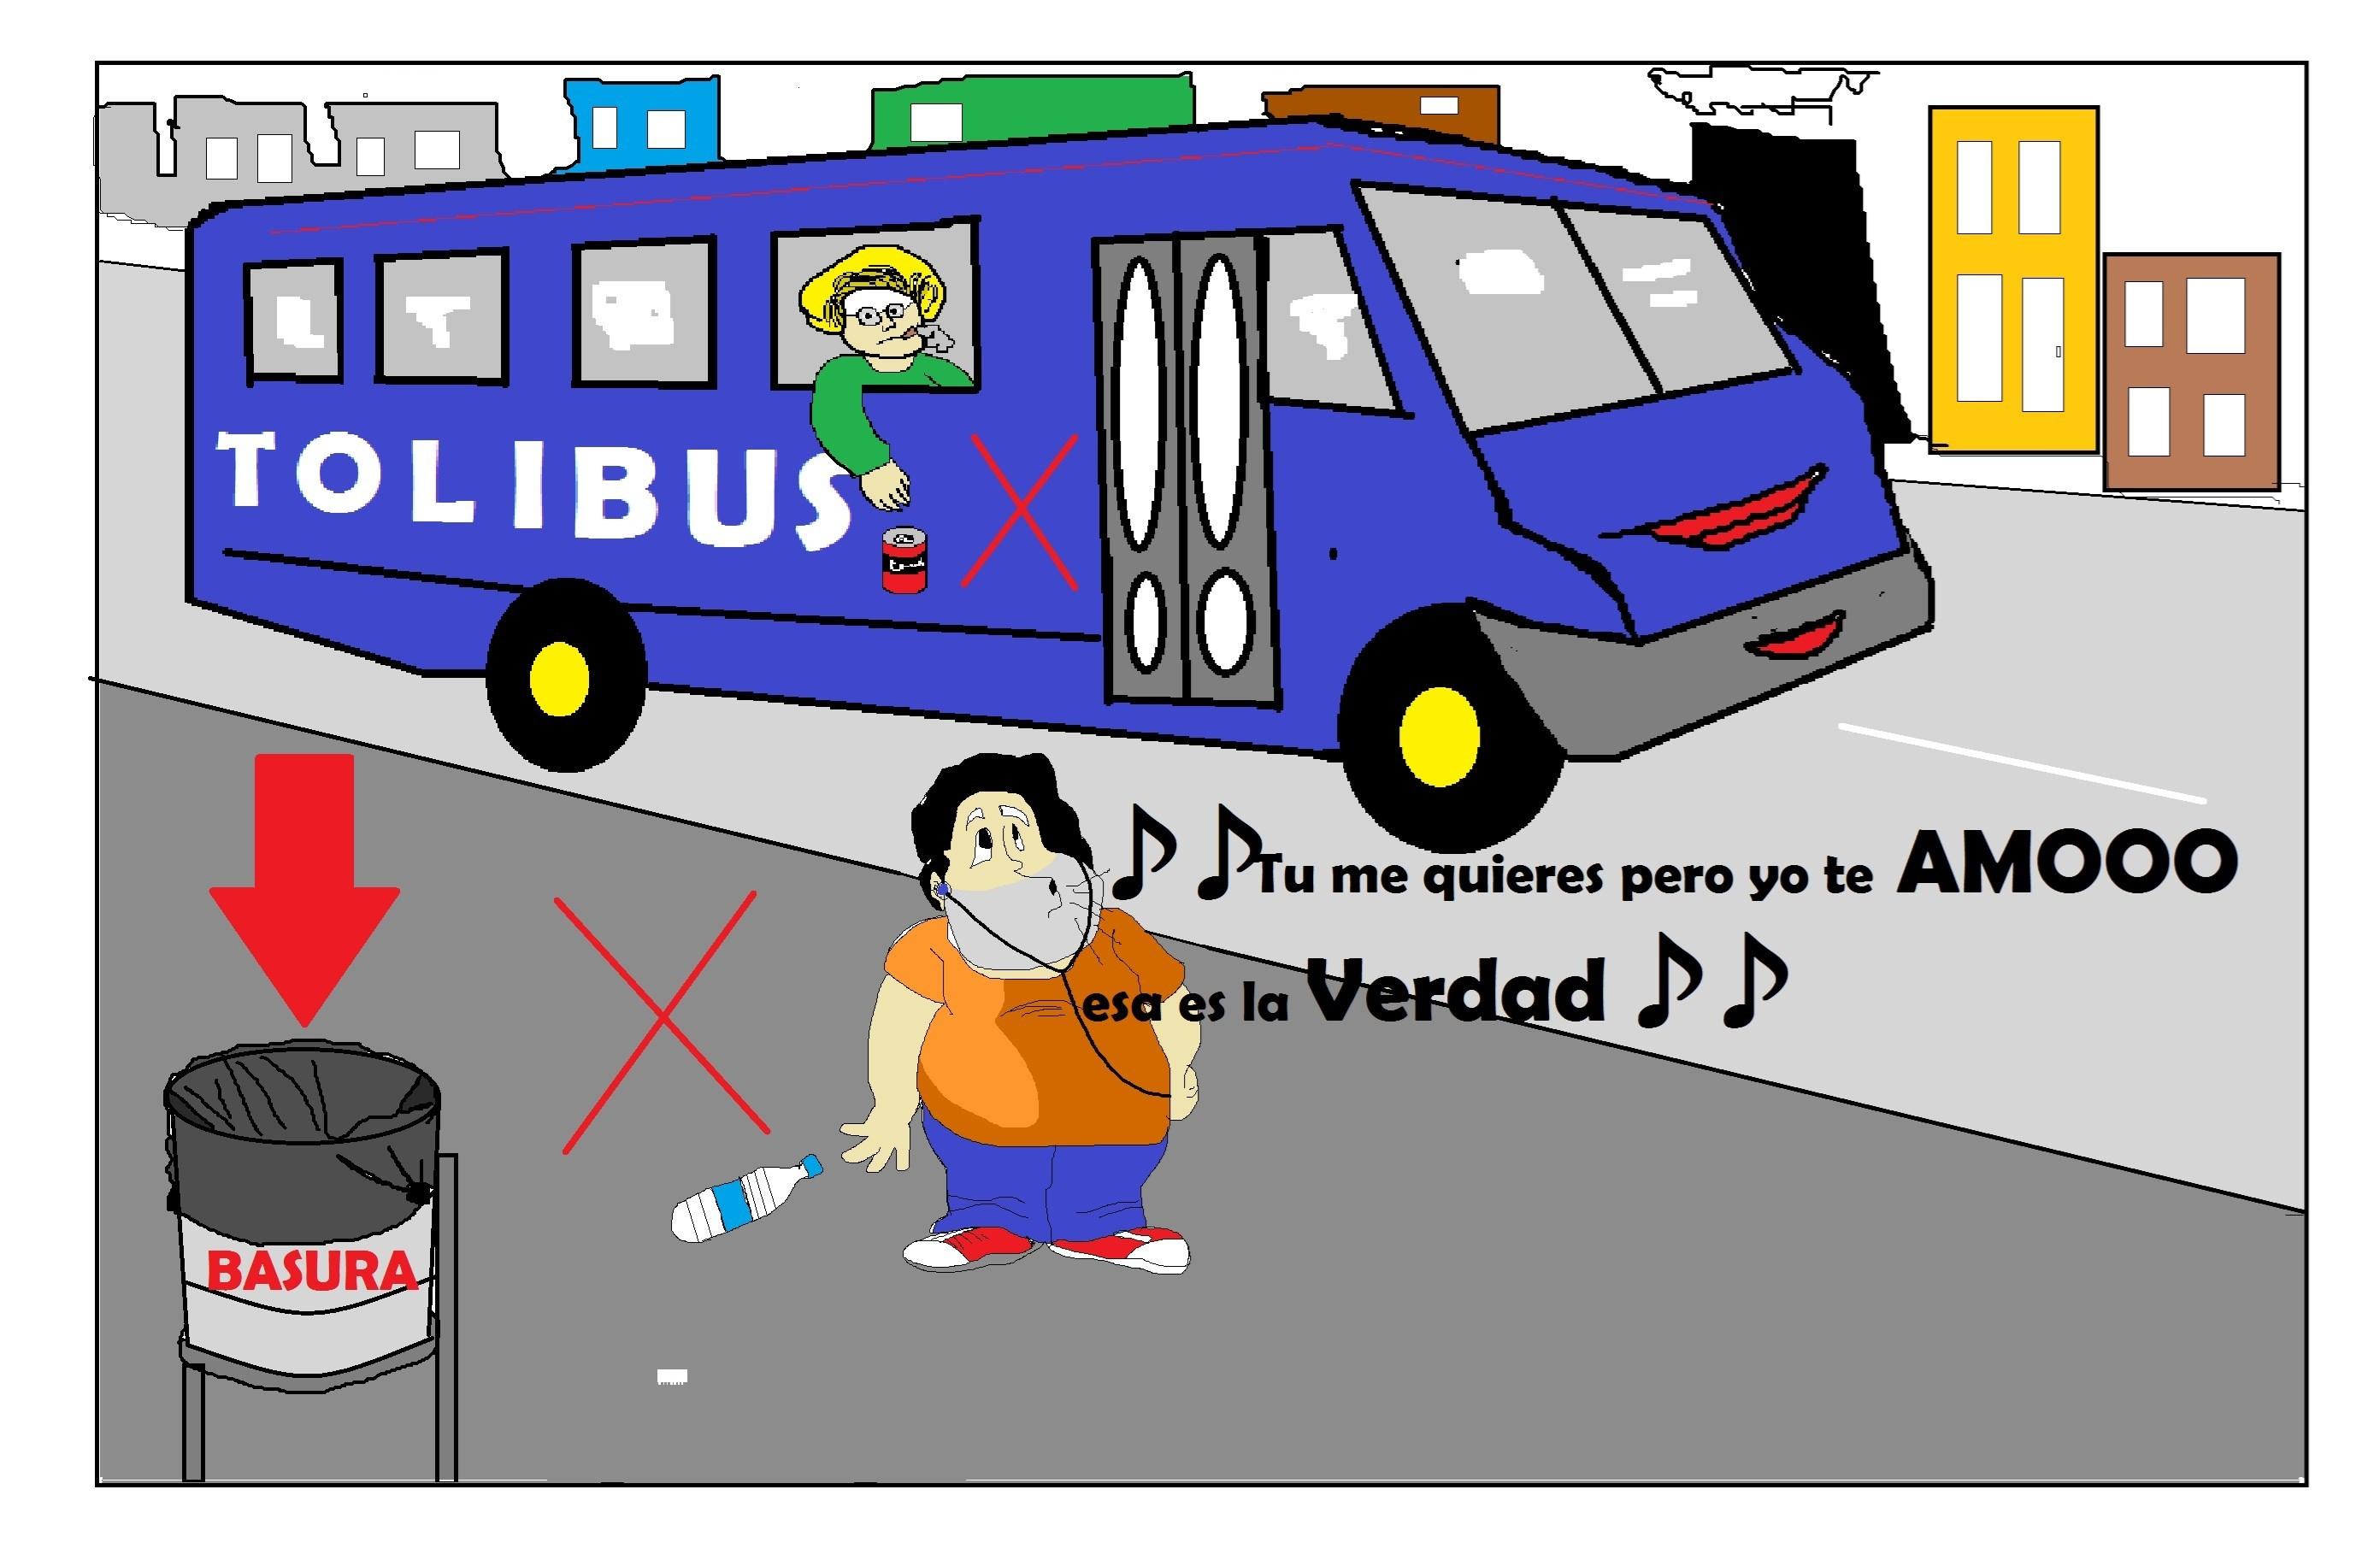 Cultura De Tirar Basura En La Calle